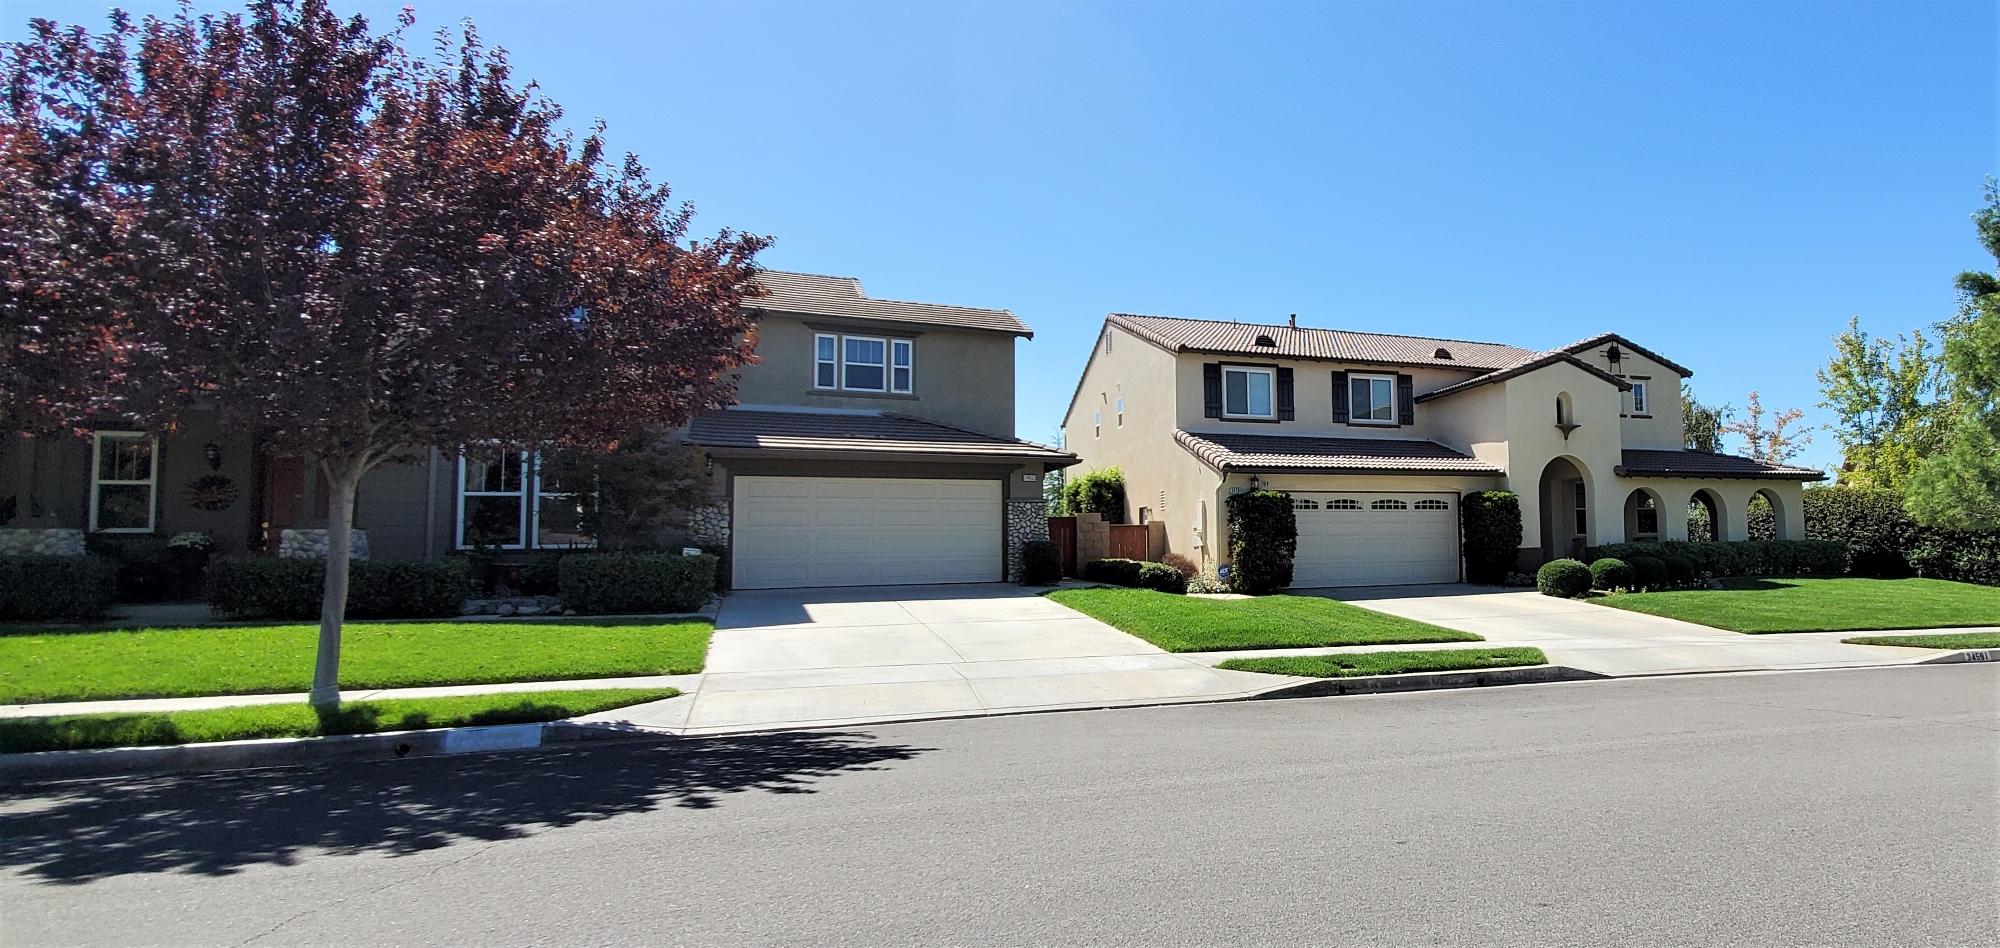 Homes in Chapman Heights in Yucaipa, California